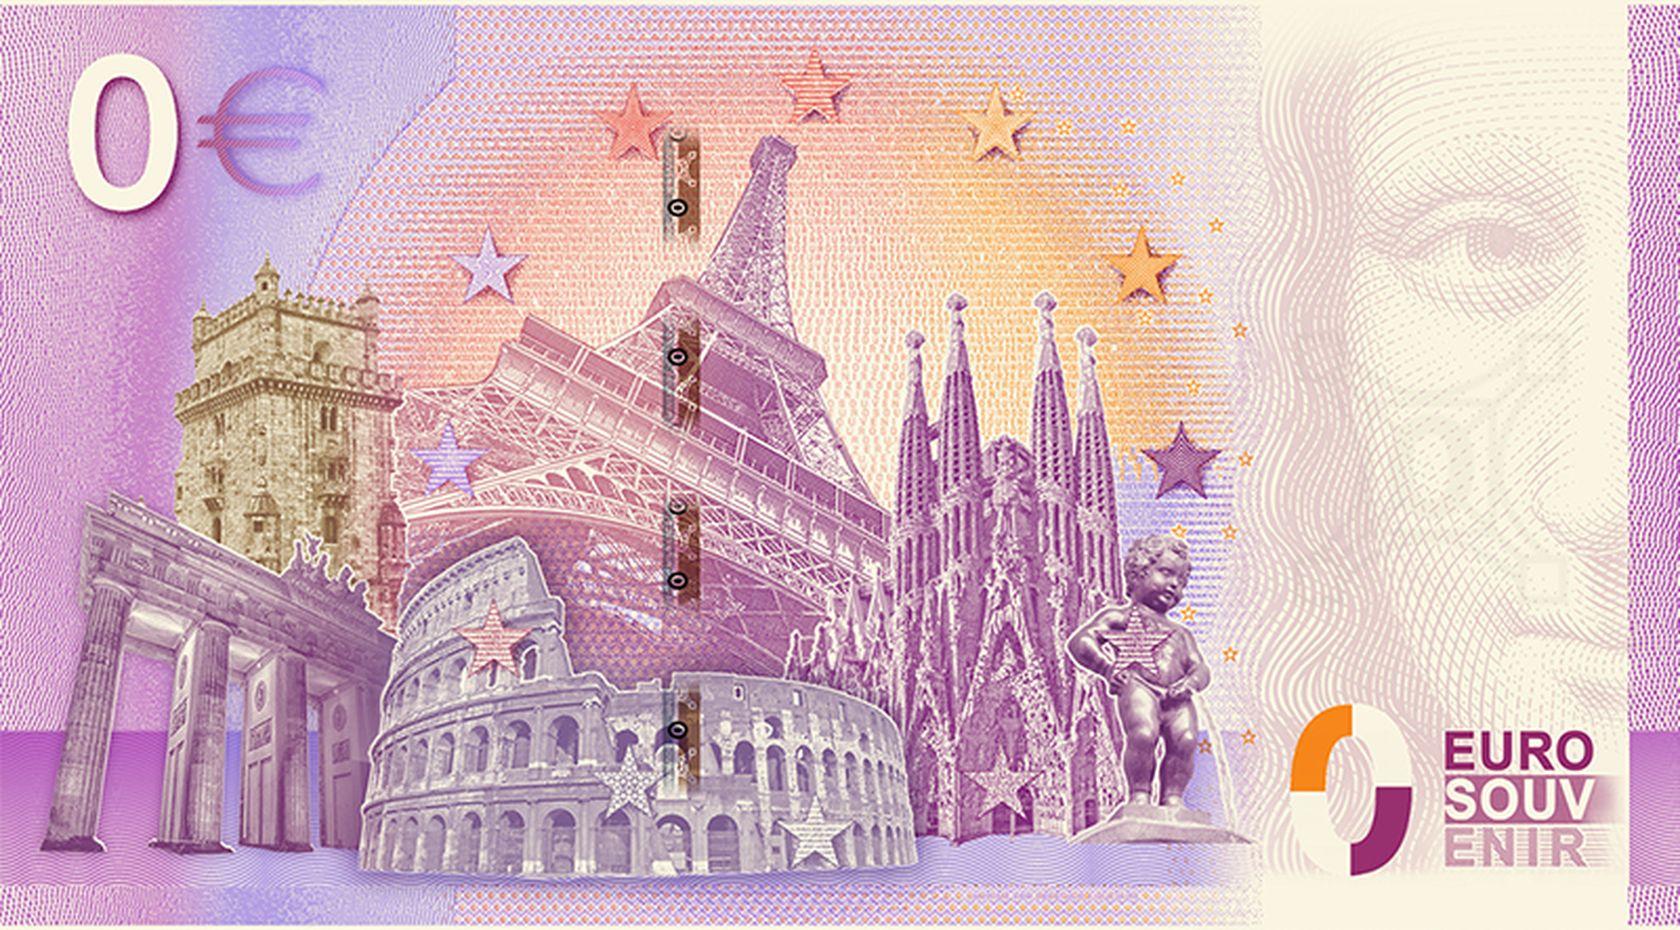 Monnaie Spirou et Fantasio Billet Euro Souvenir 01 Euro Banknote Memory 2